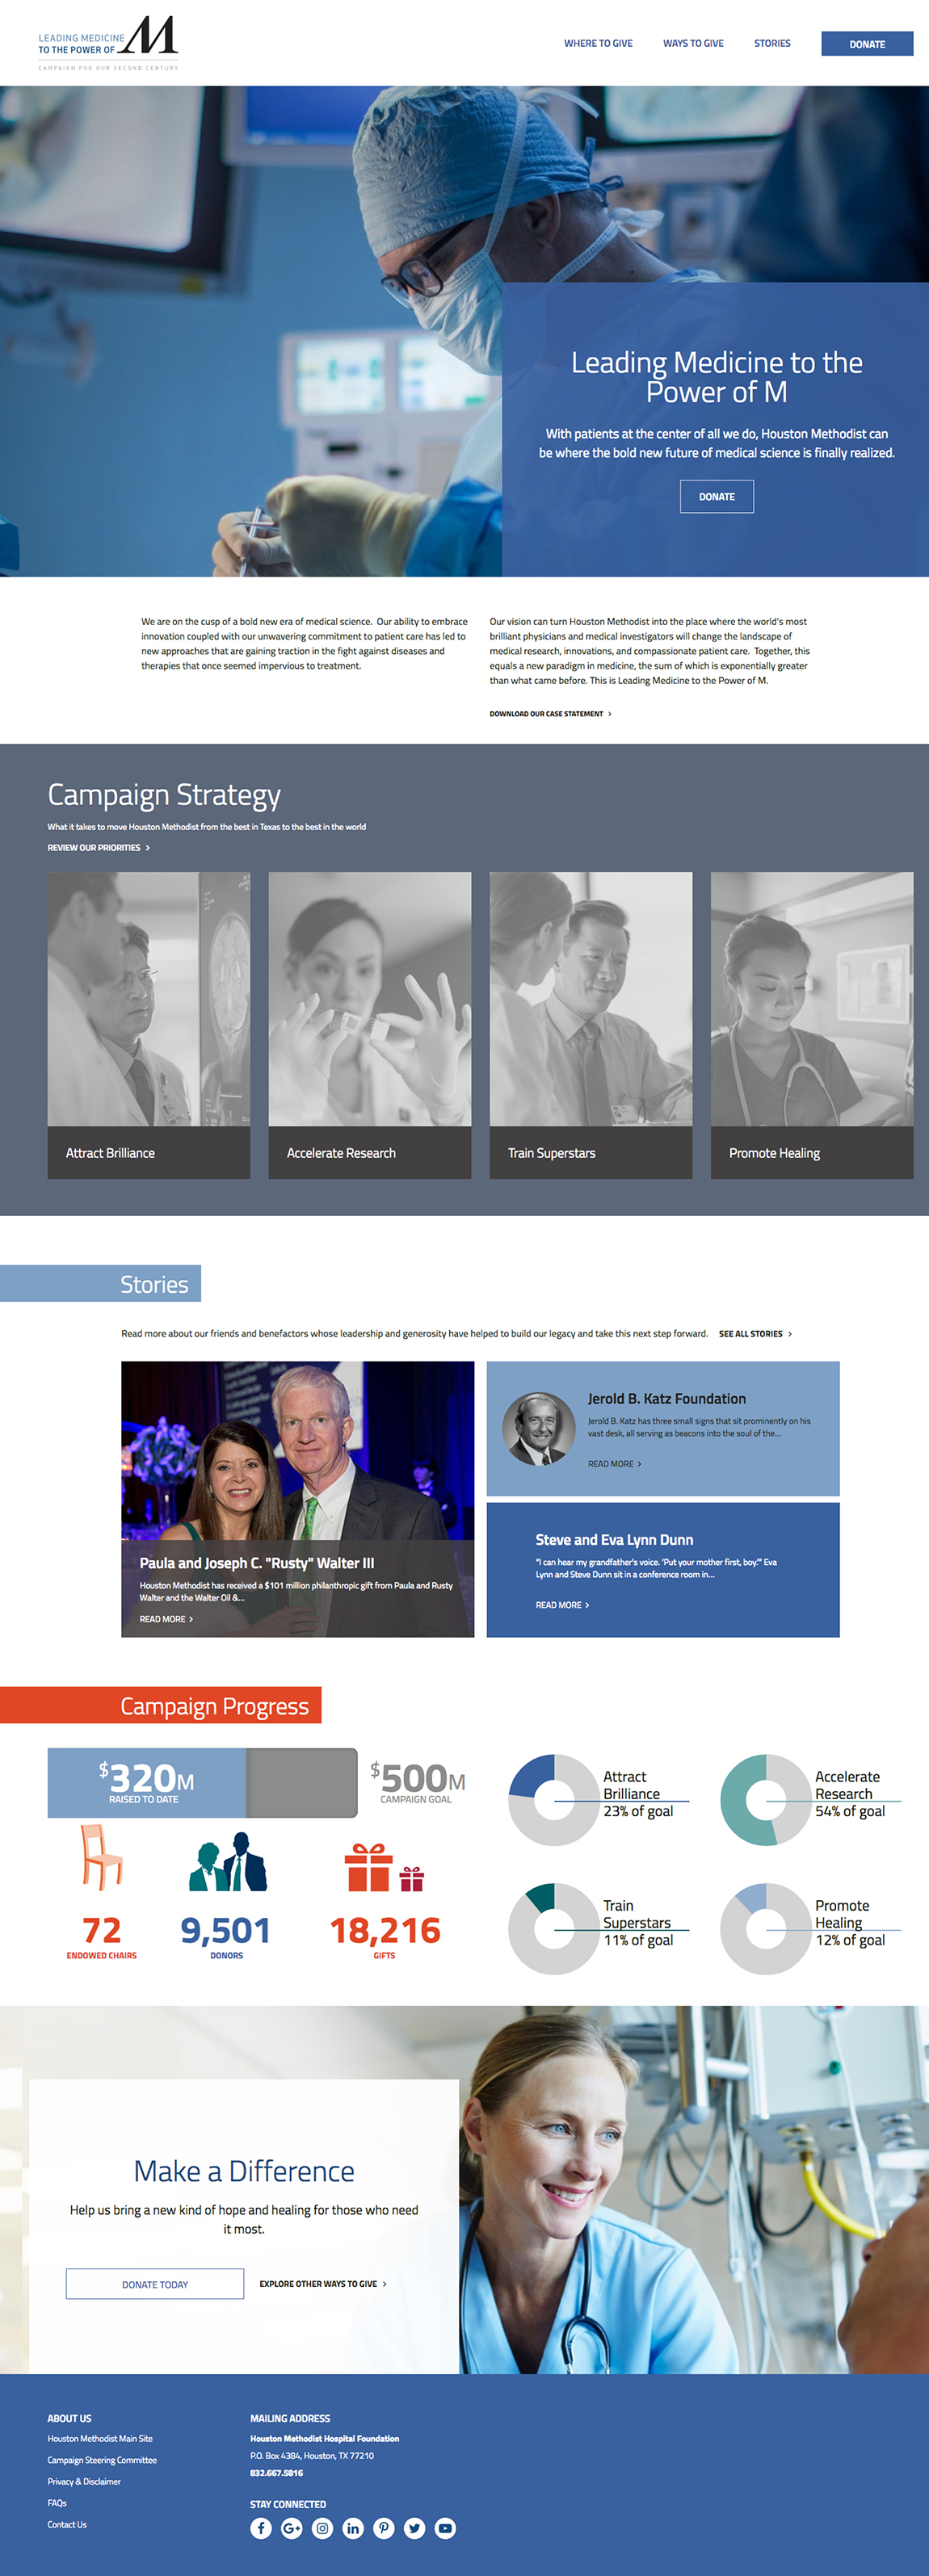 Houston Methodist Donation Website   Hero Digital